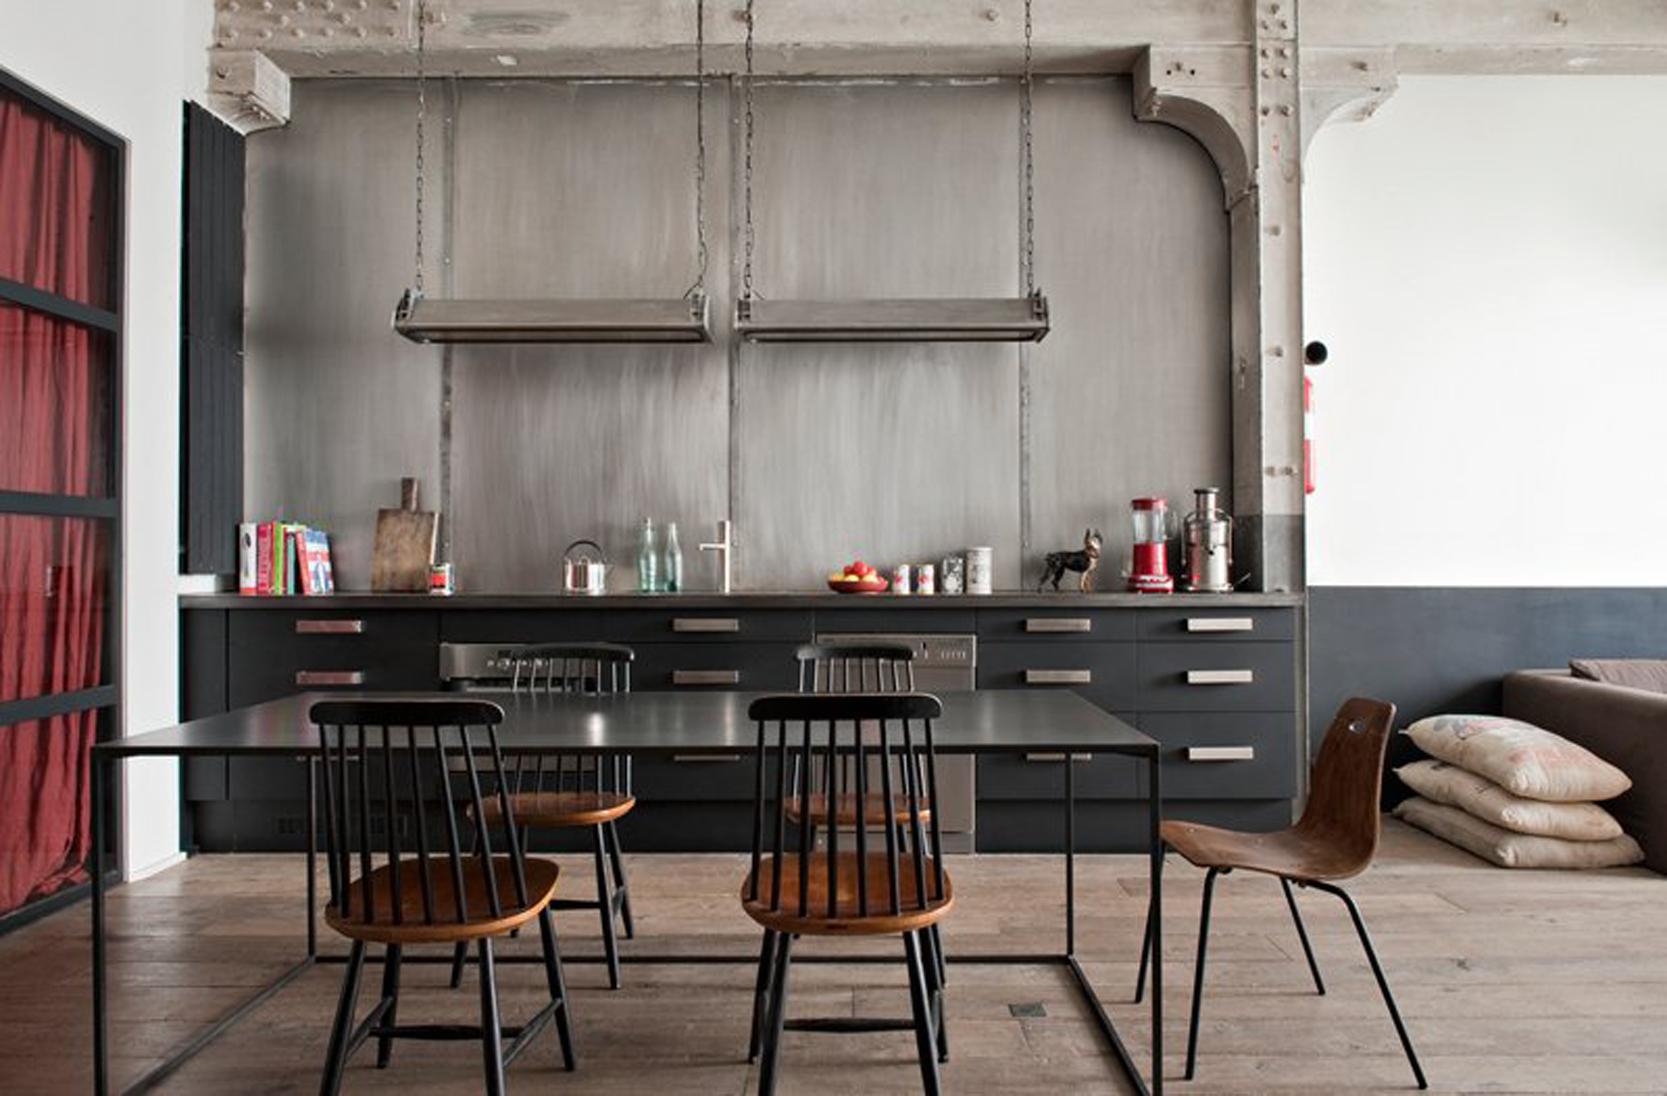 delightful-industrial-apartment-in-belleville-industrial-chic-kitchen